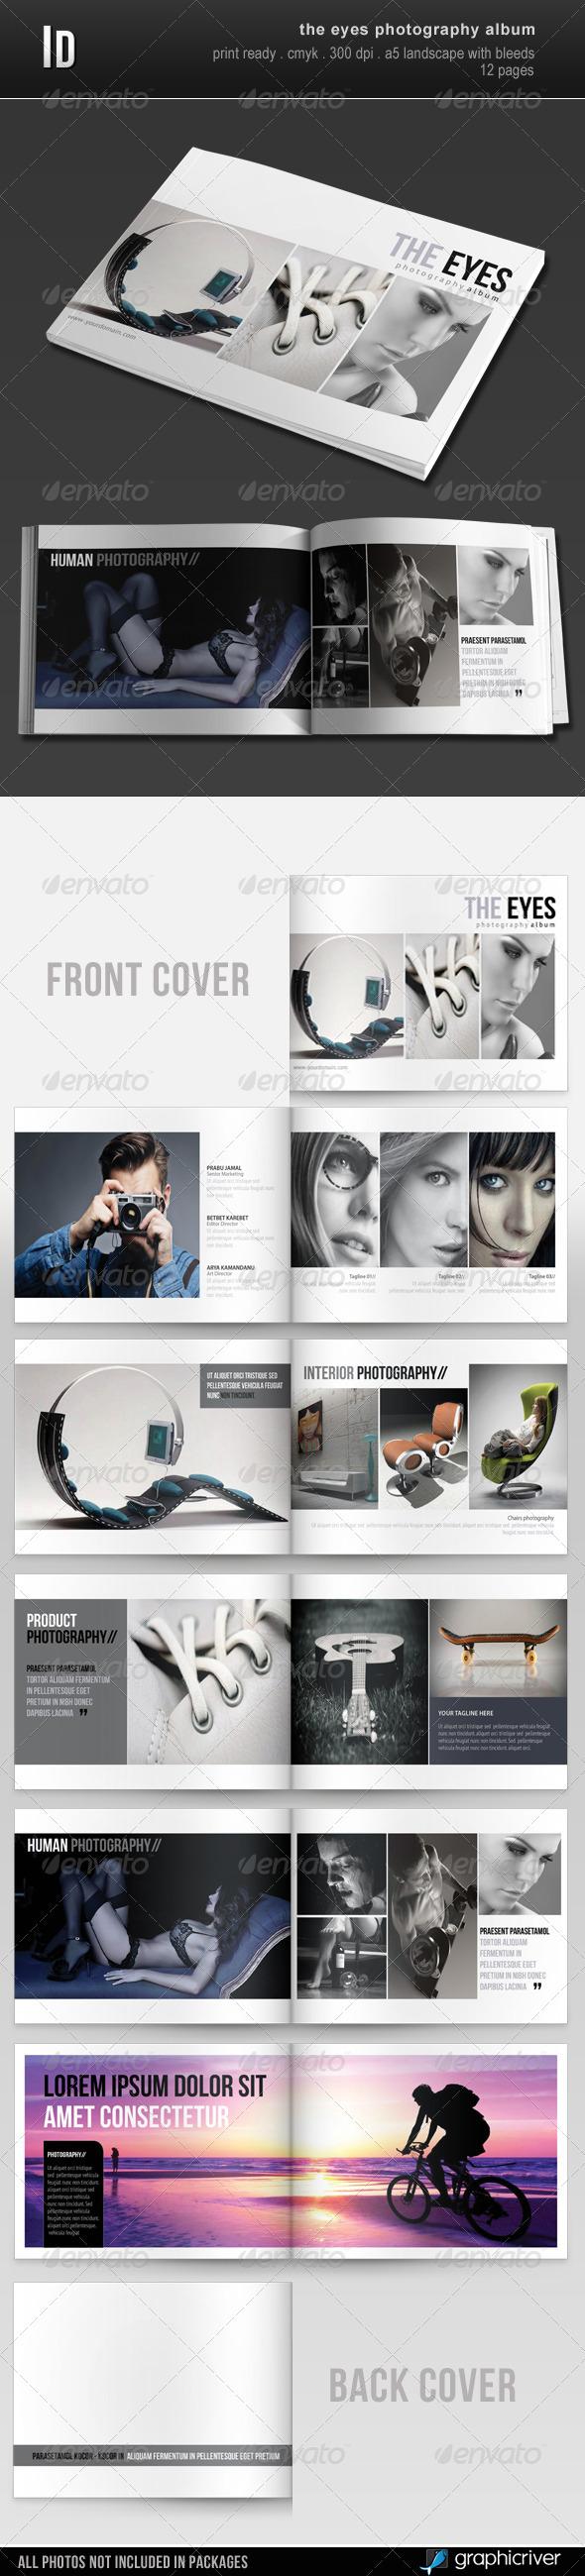 The Eyes Photography Album